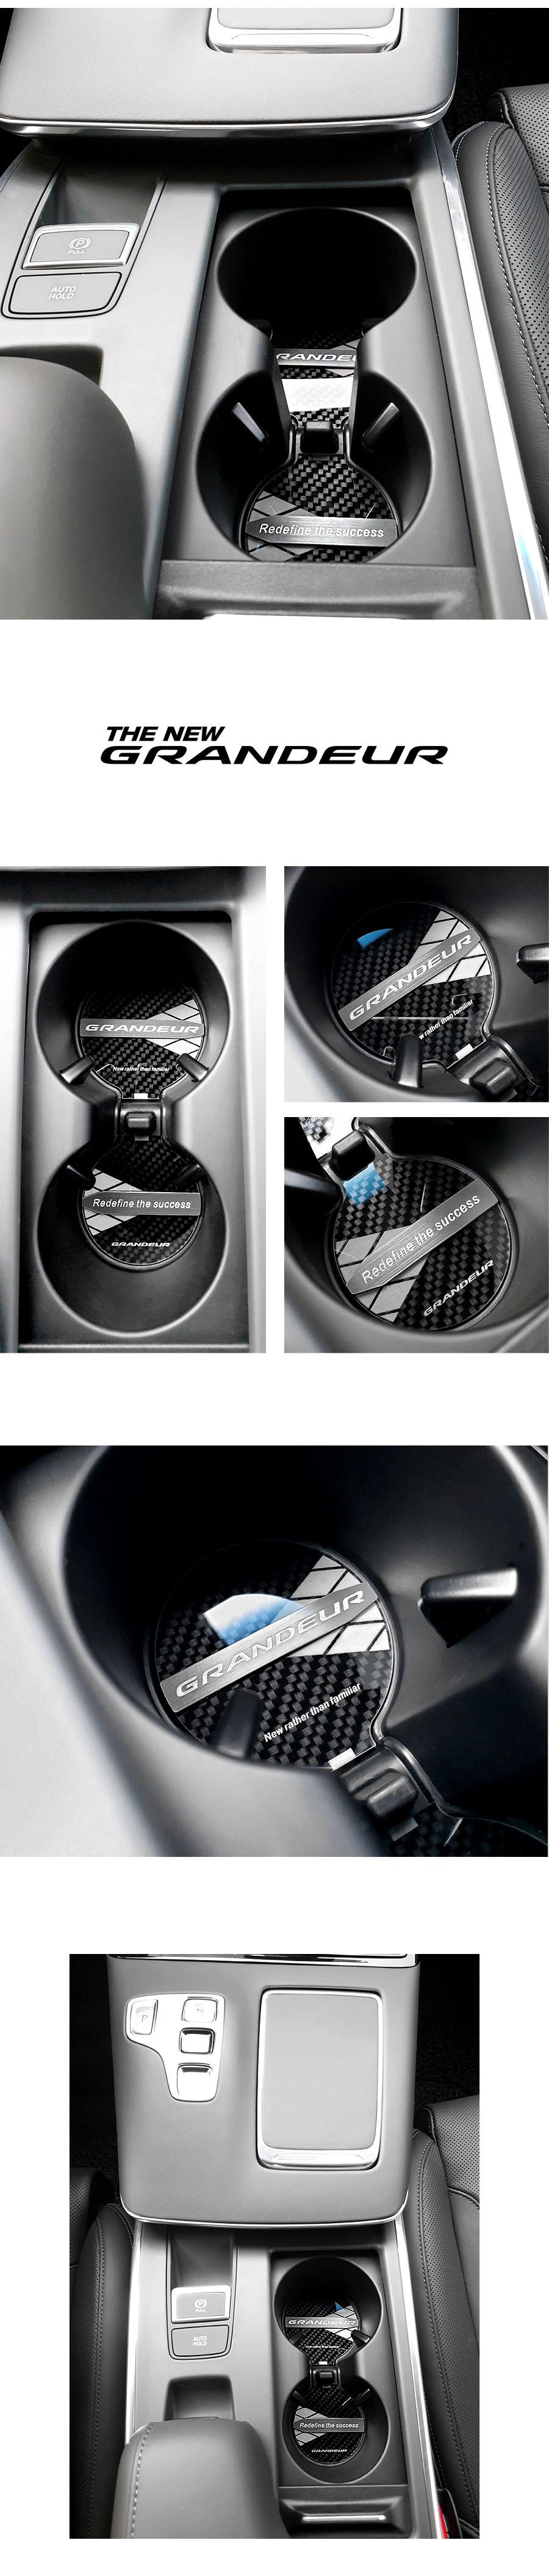 the-new-grandeur-layered-cup-door_03.jpg